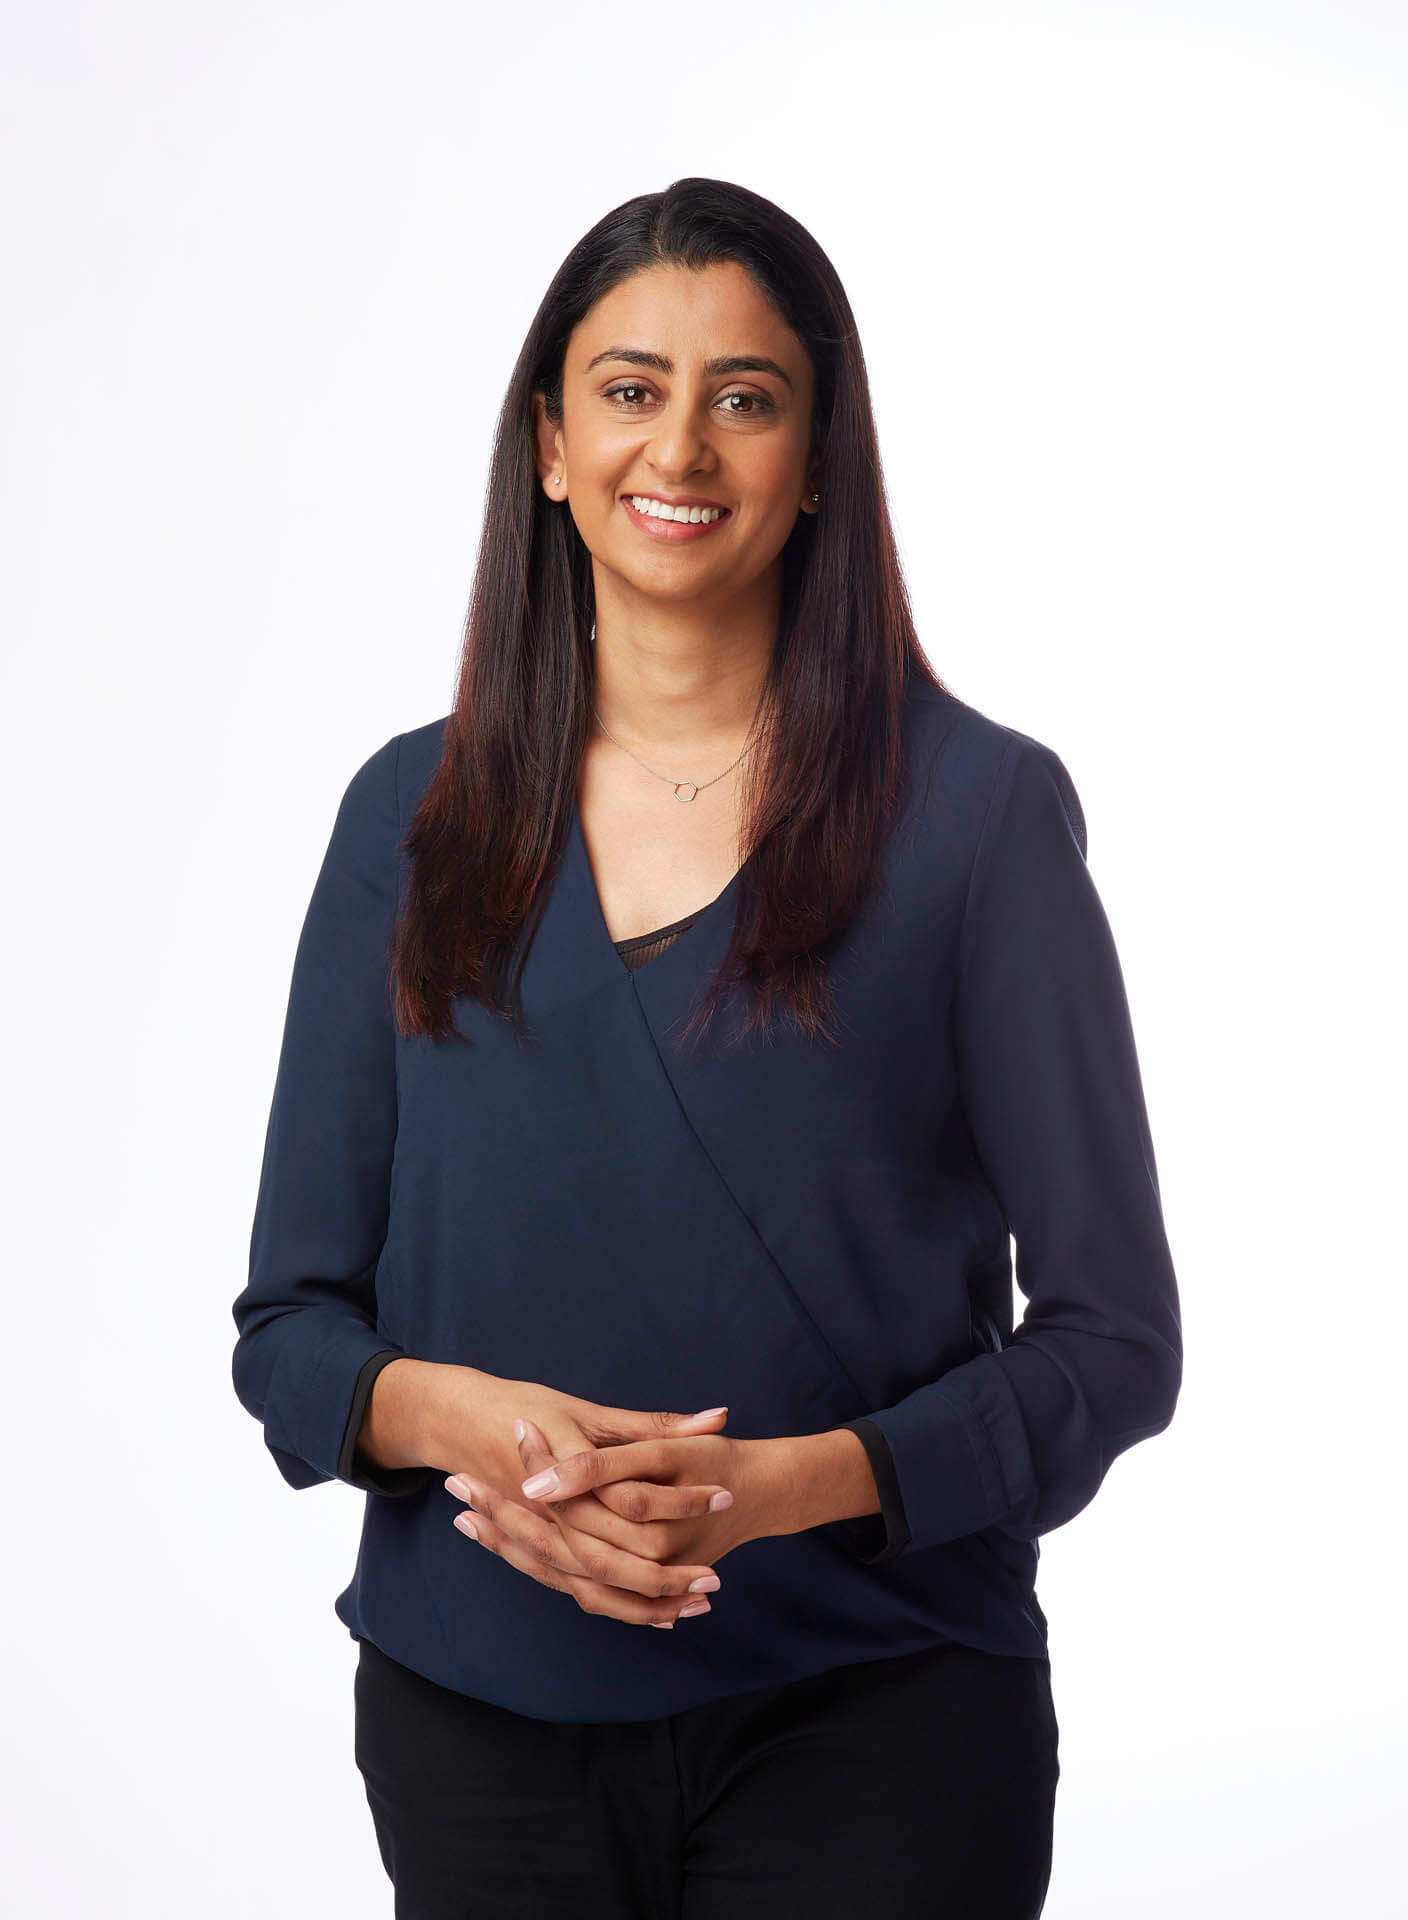 Amber Desai, Assistant Accountant